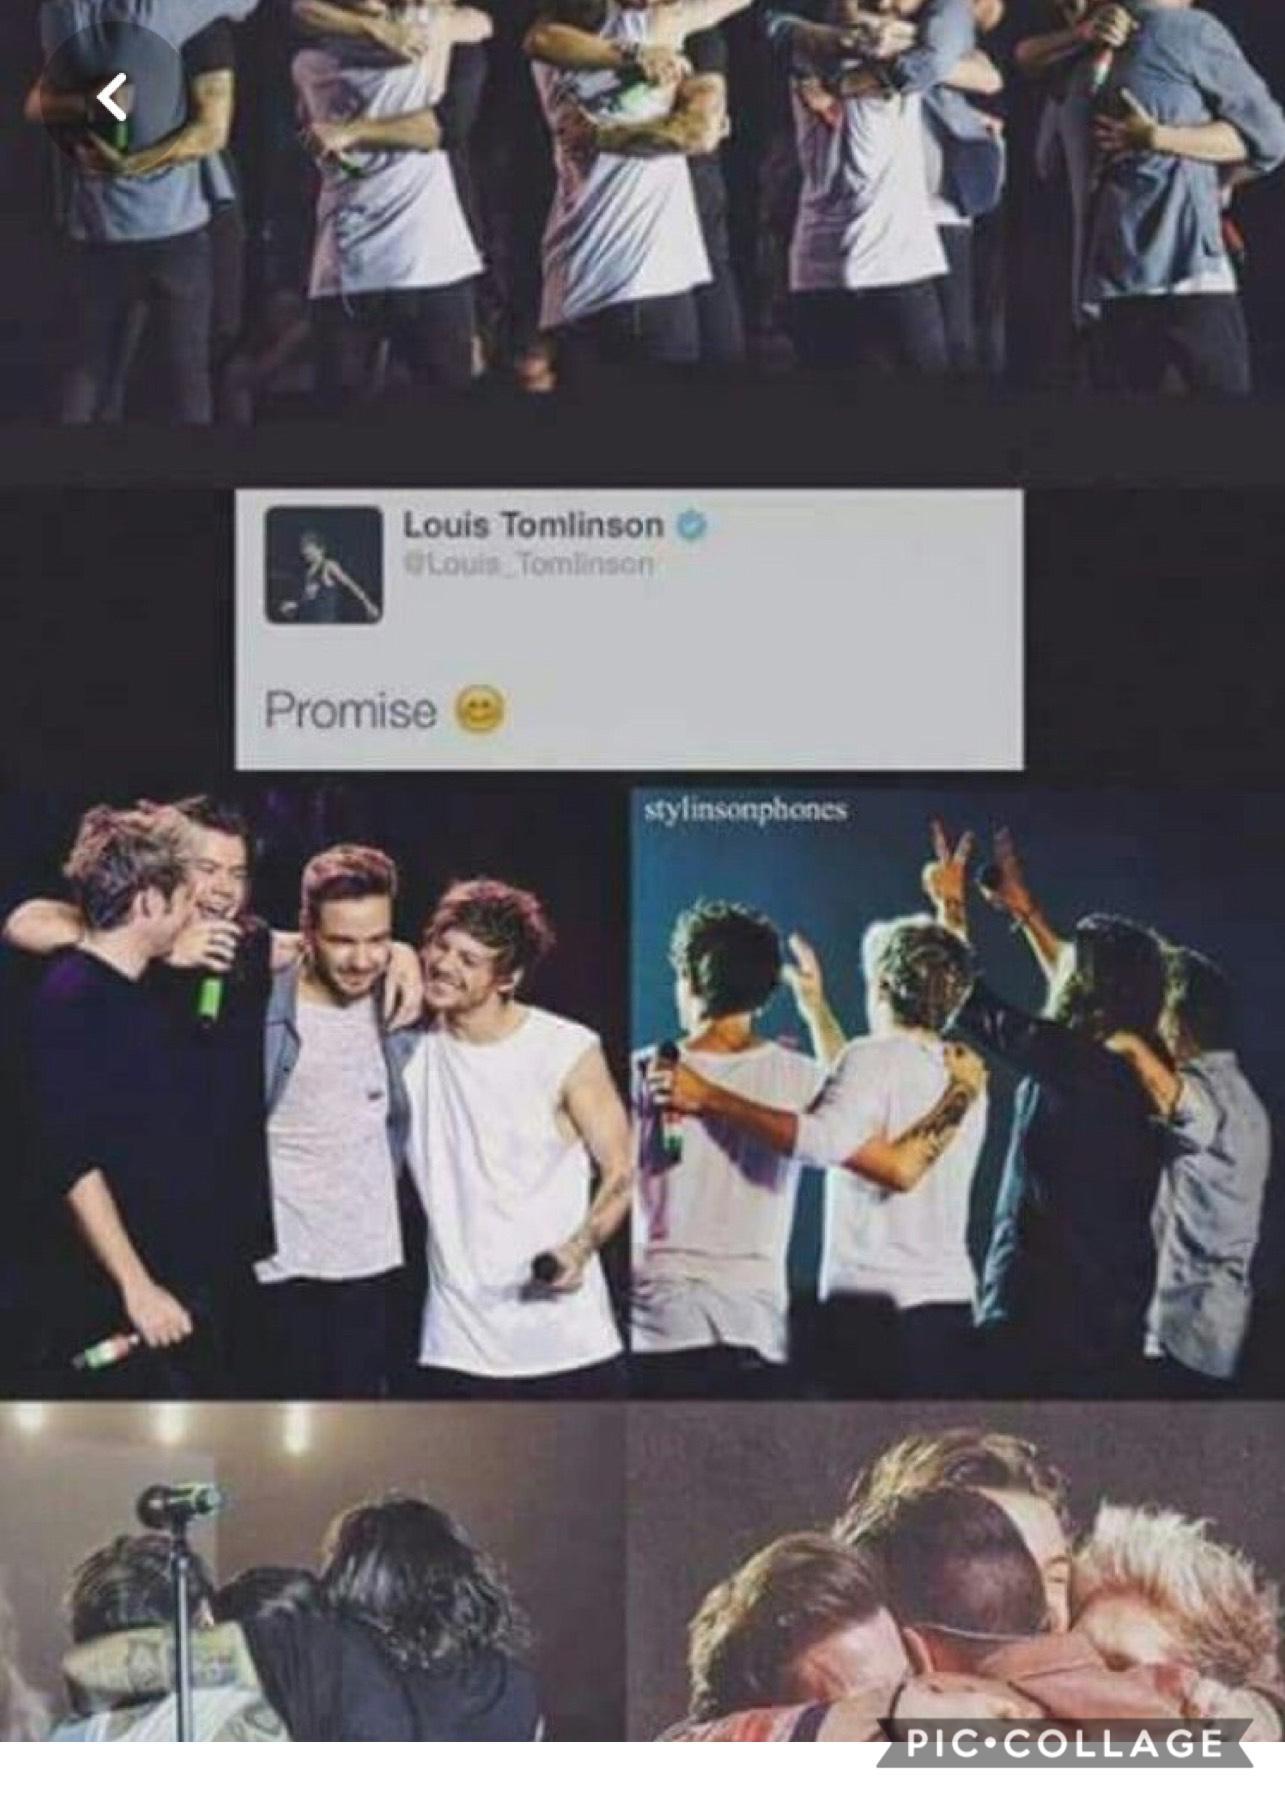 I actually cried